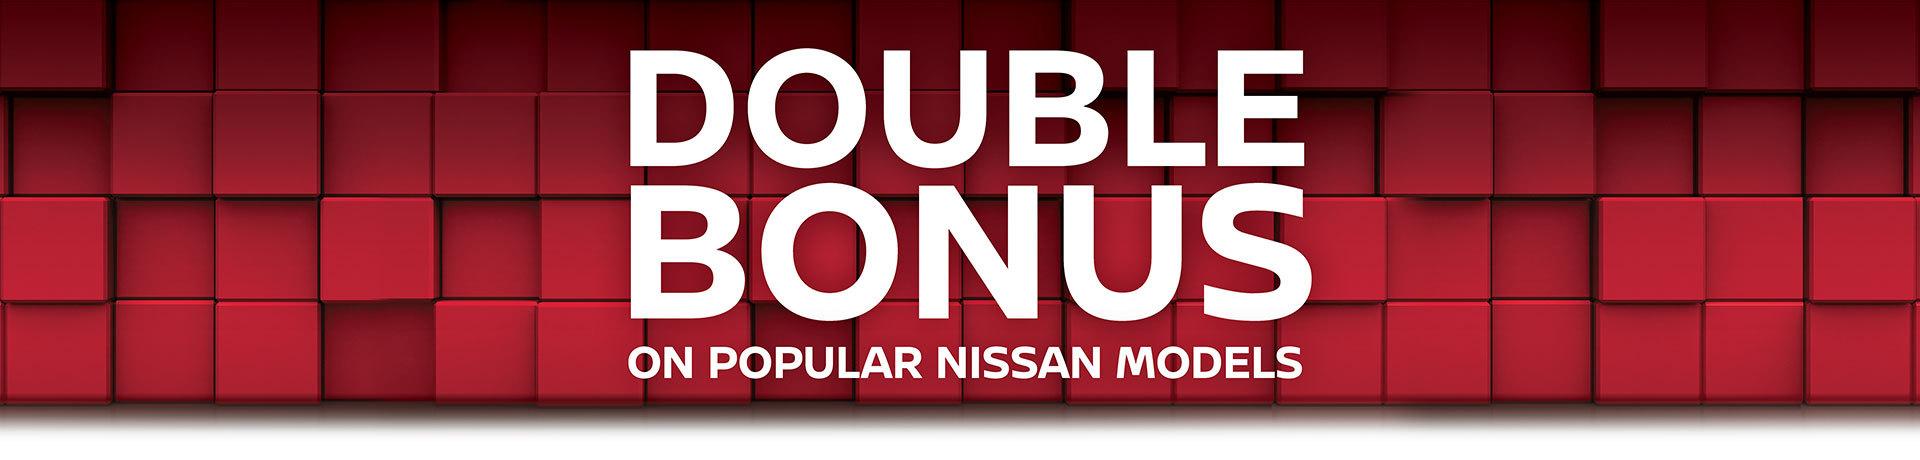 Double Bonus On Popular Nissan Models